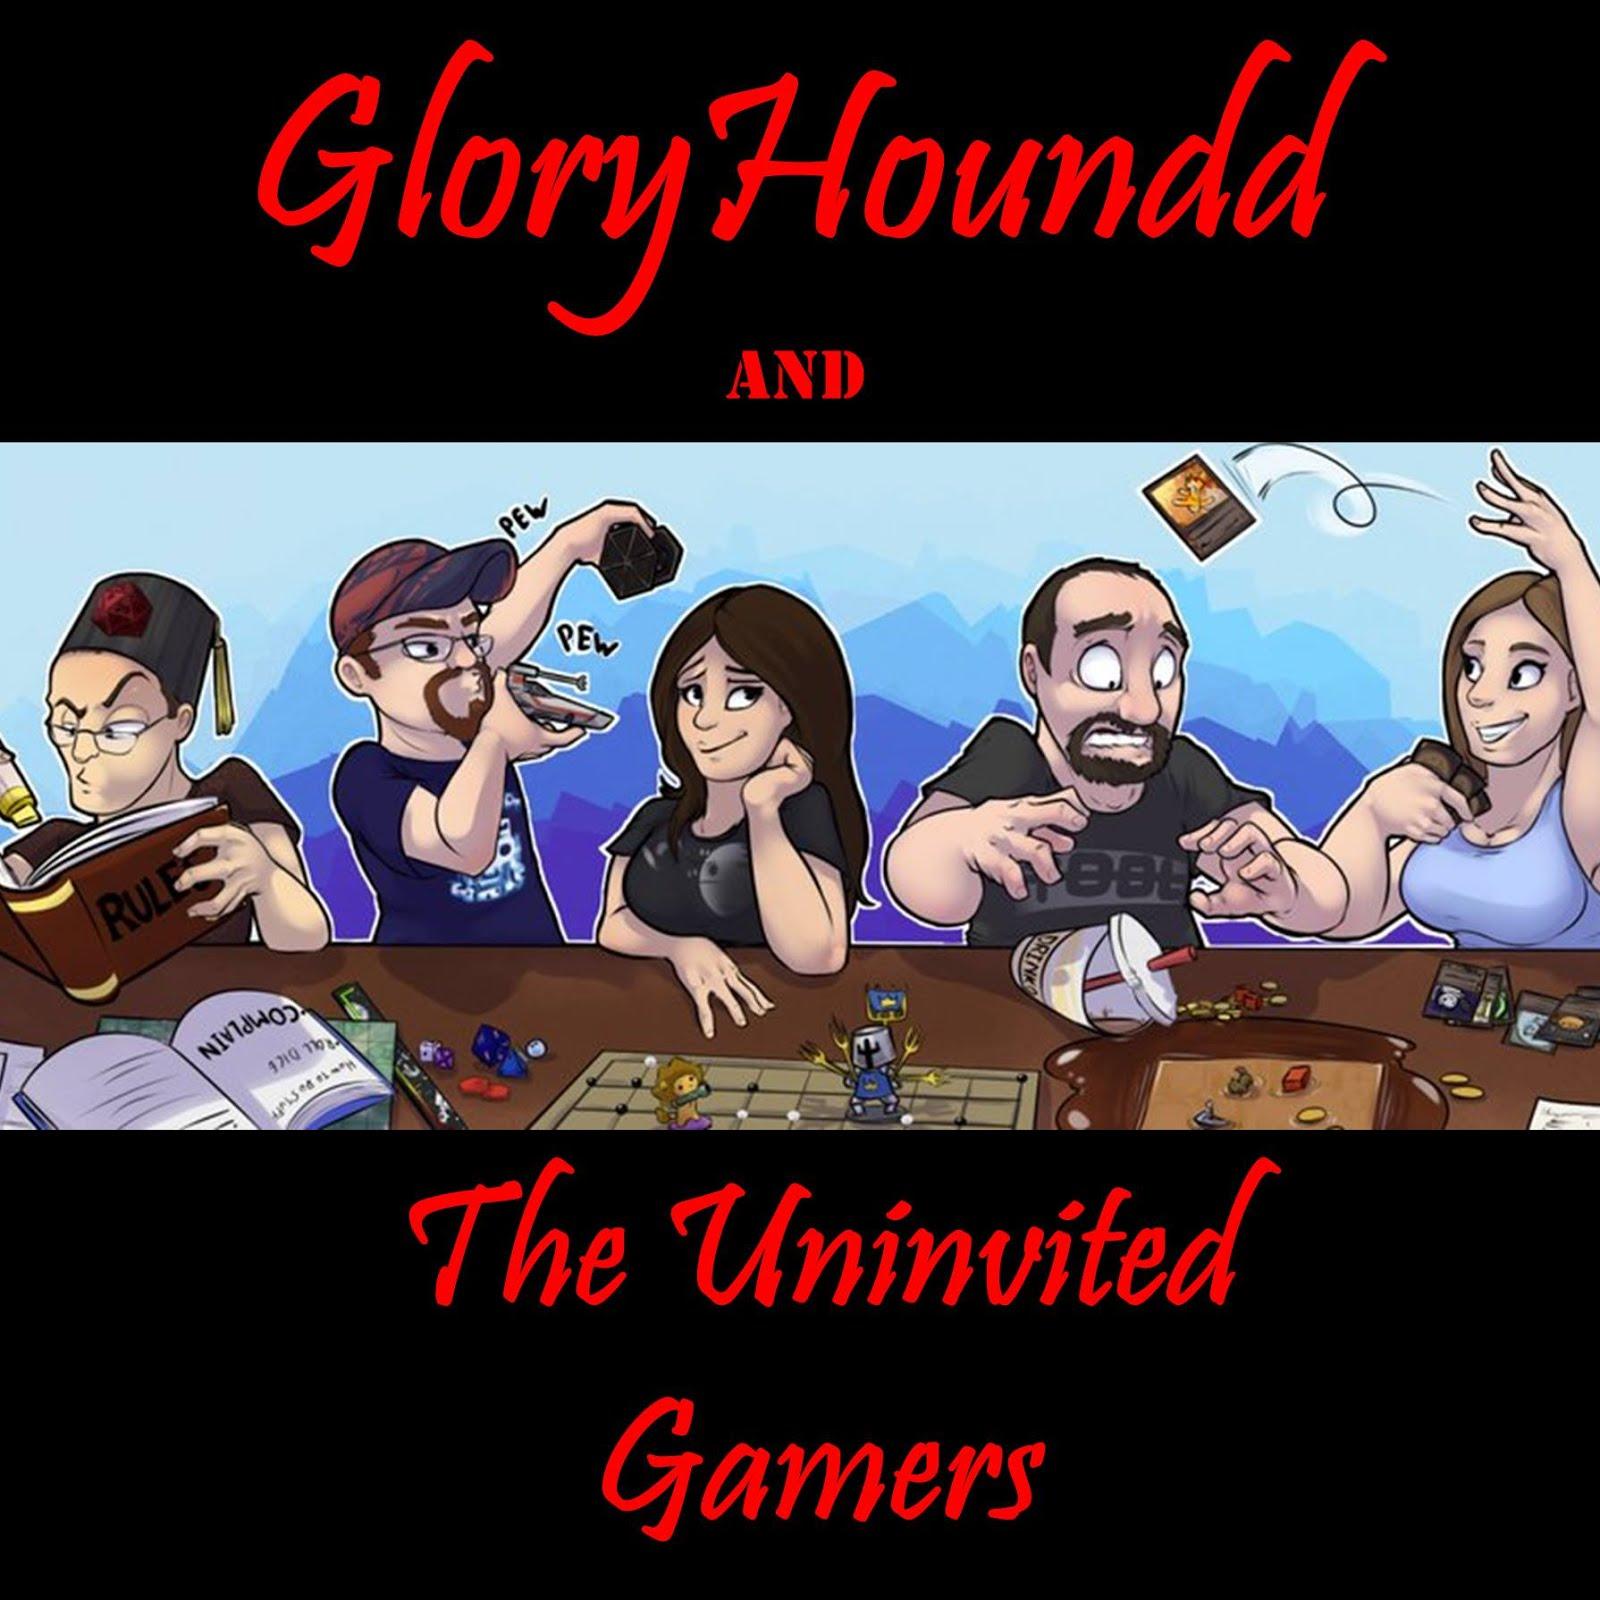 Visit GloryHoundd.com